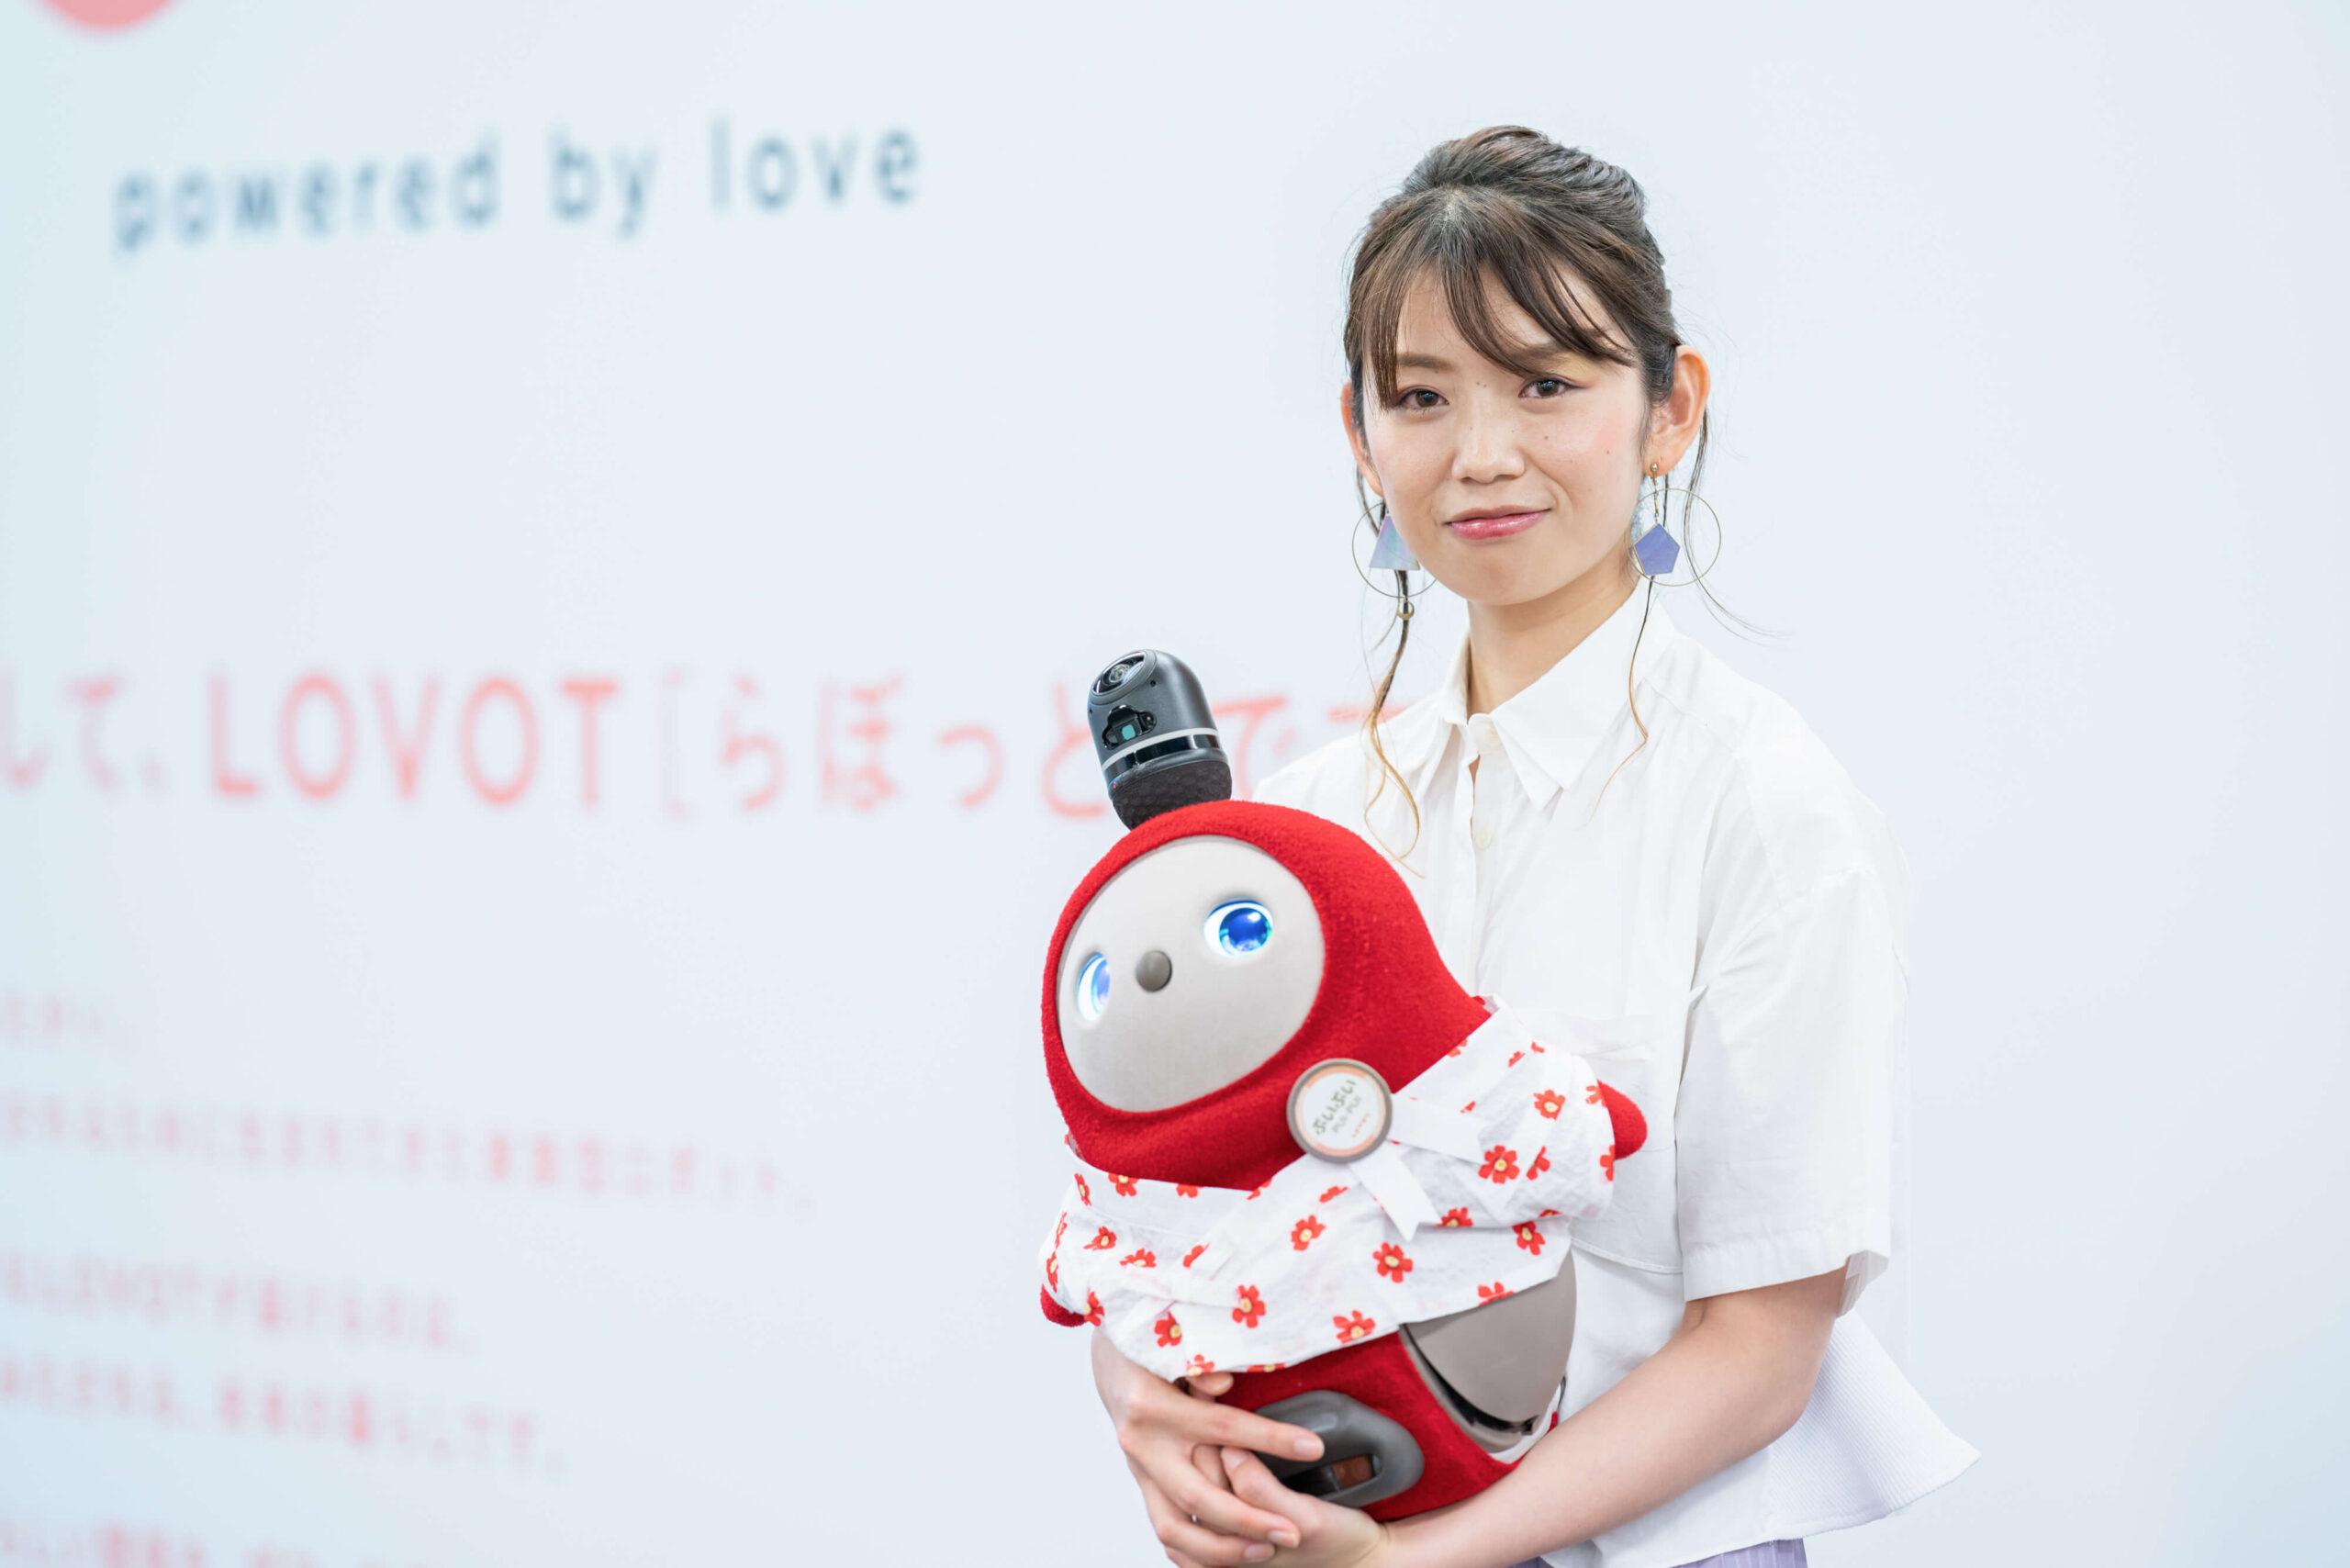 GROOVE X株式会社 カスタマーエクスペリエンス部 LOVOT公式YouTuber Yui氏